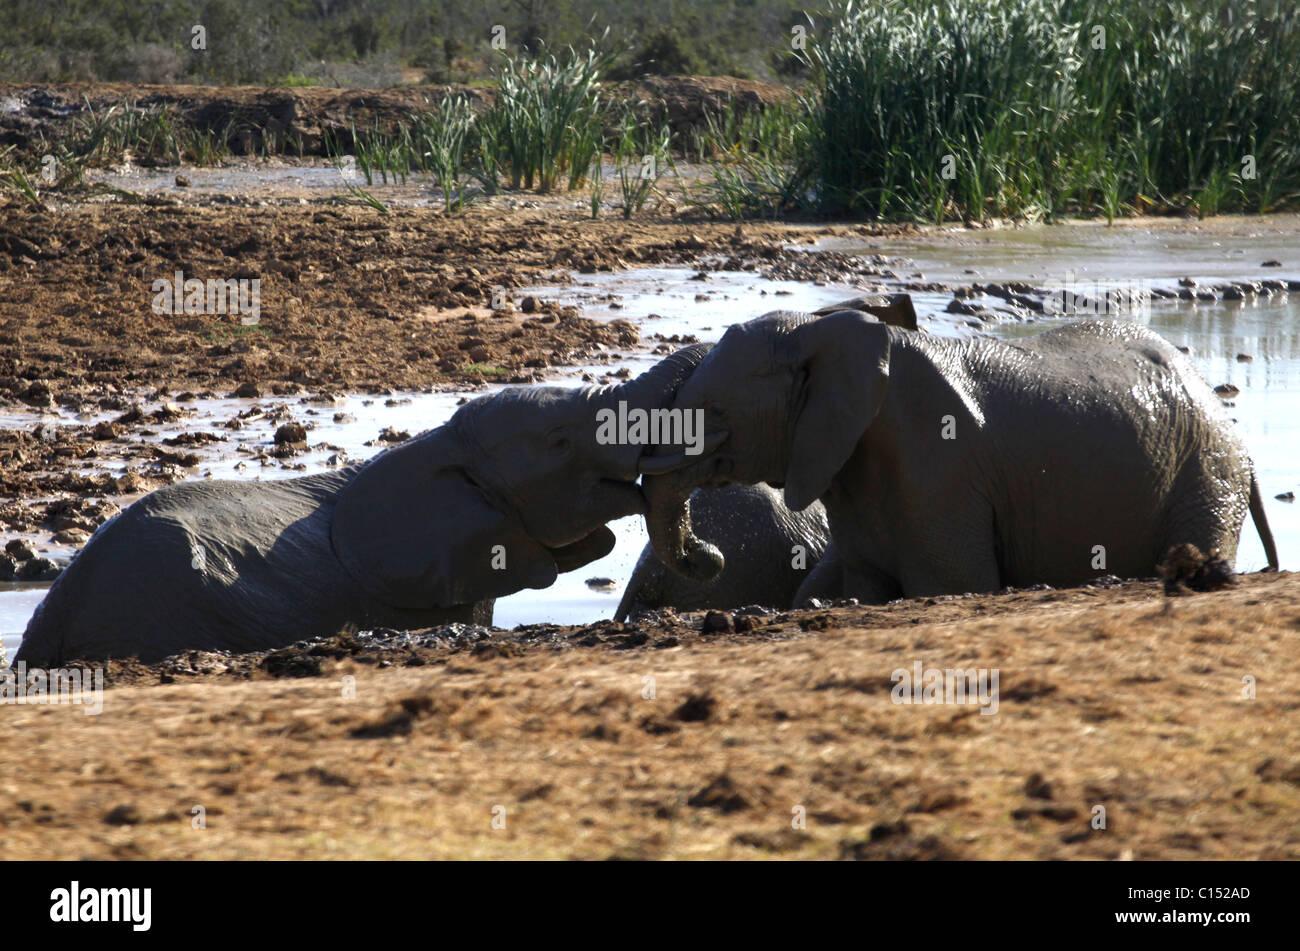 Elefanten Sperren gemeinsam ADDO Südafrika ADDO Nationalpark EASTERN CAPE Süd Afrika ADDO ELEPHANT NATIONAL Stockbild